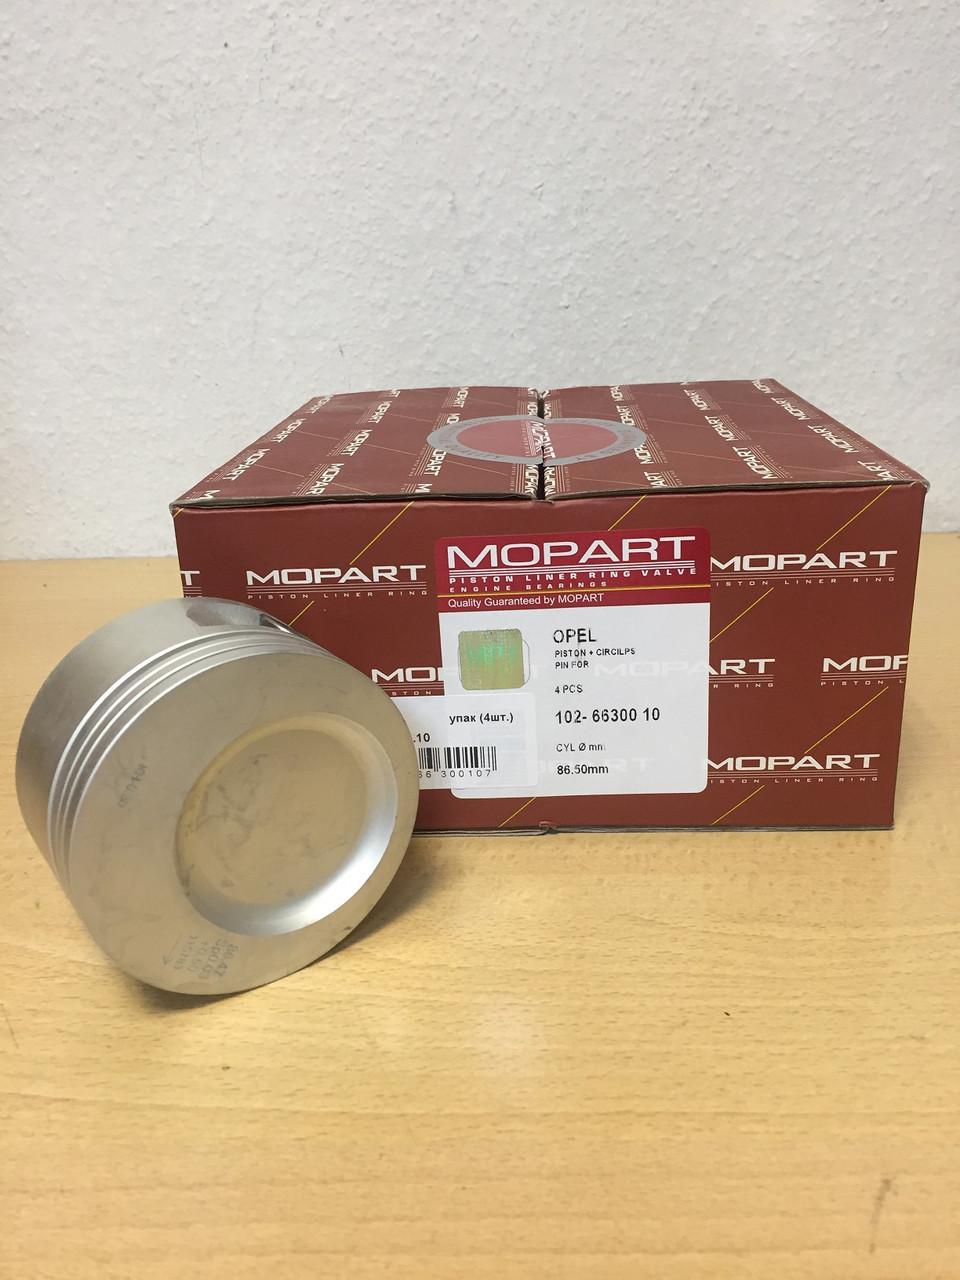 Поршень OPEL 86.50 2.0 C20NE/20SE/C20E (Mopart) 102-66300 10